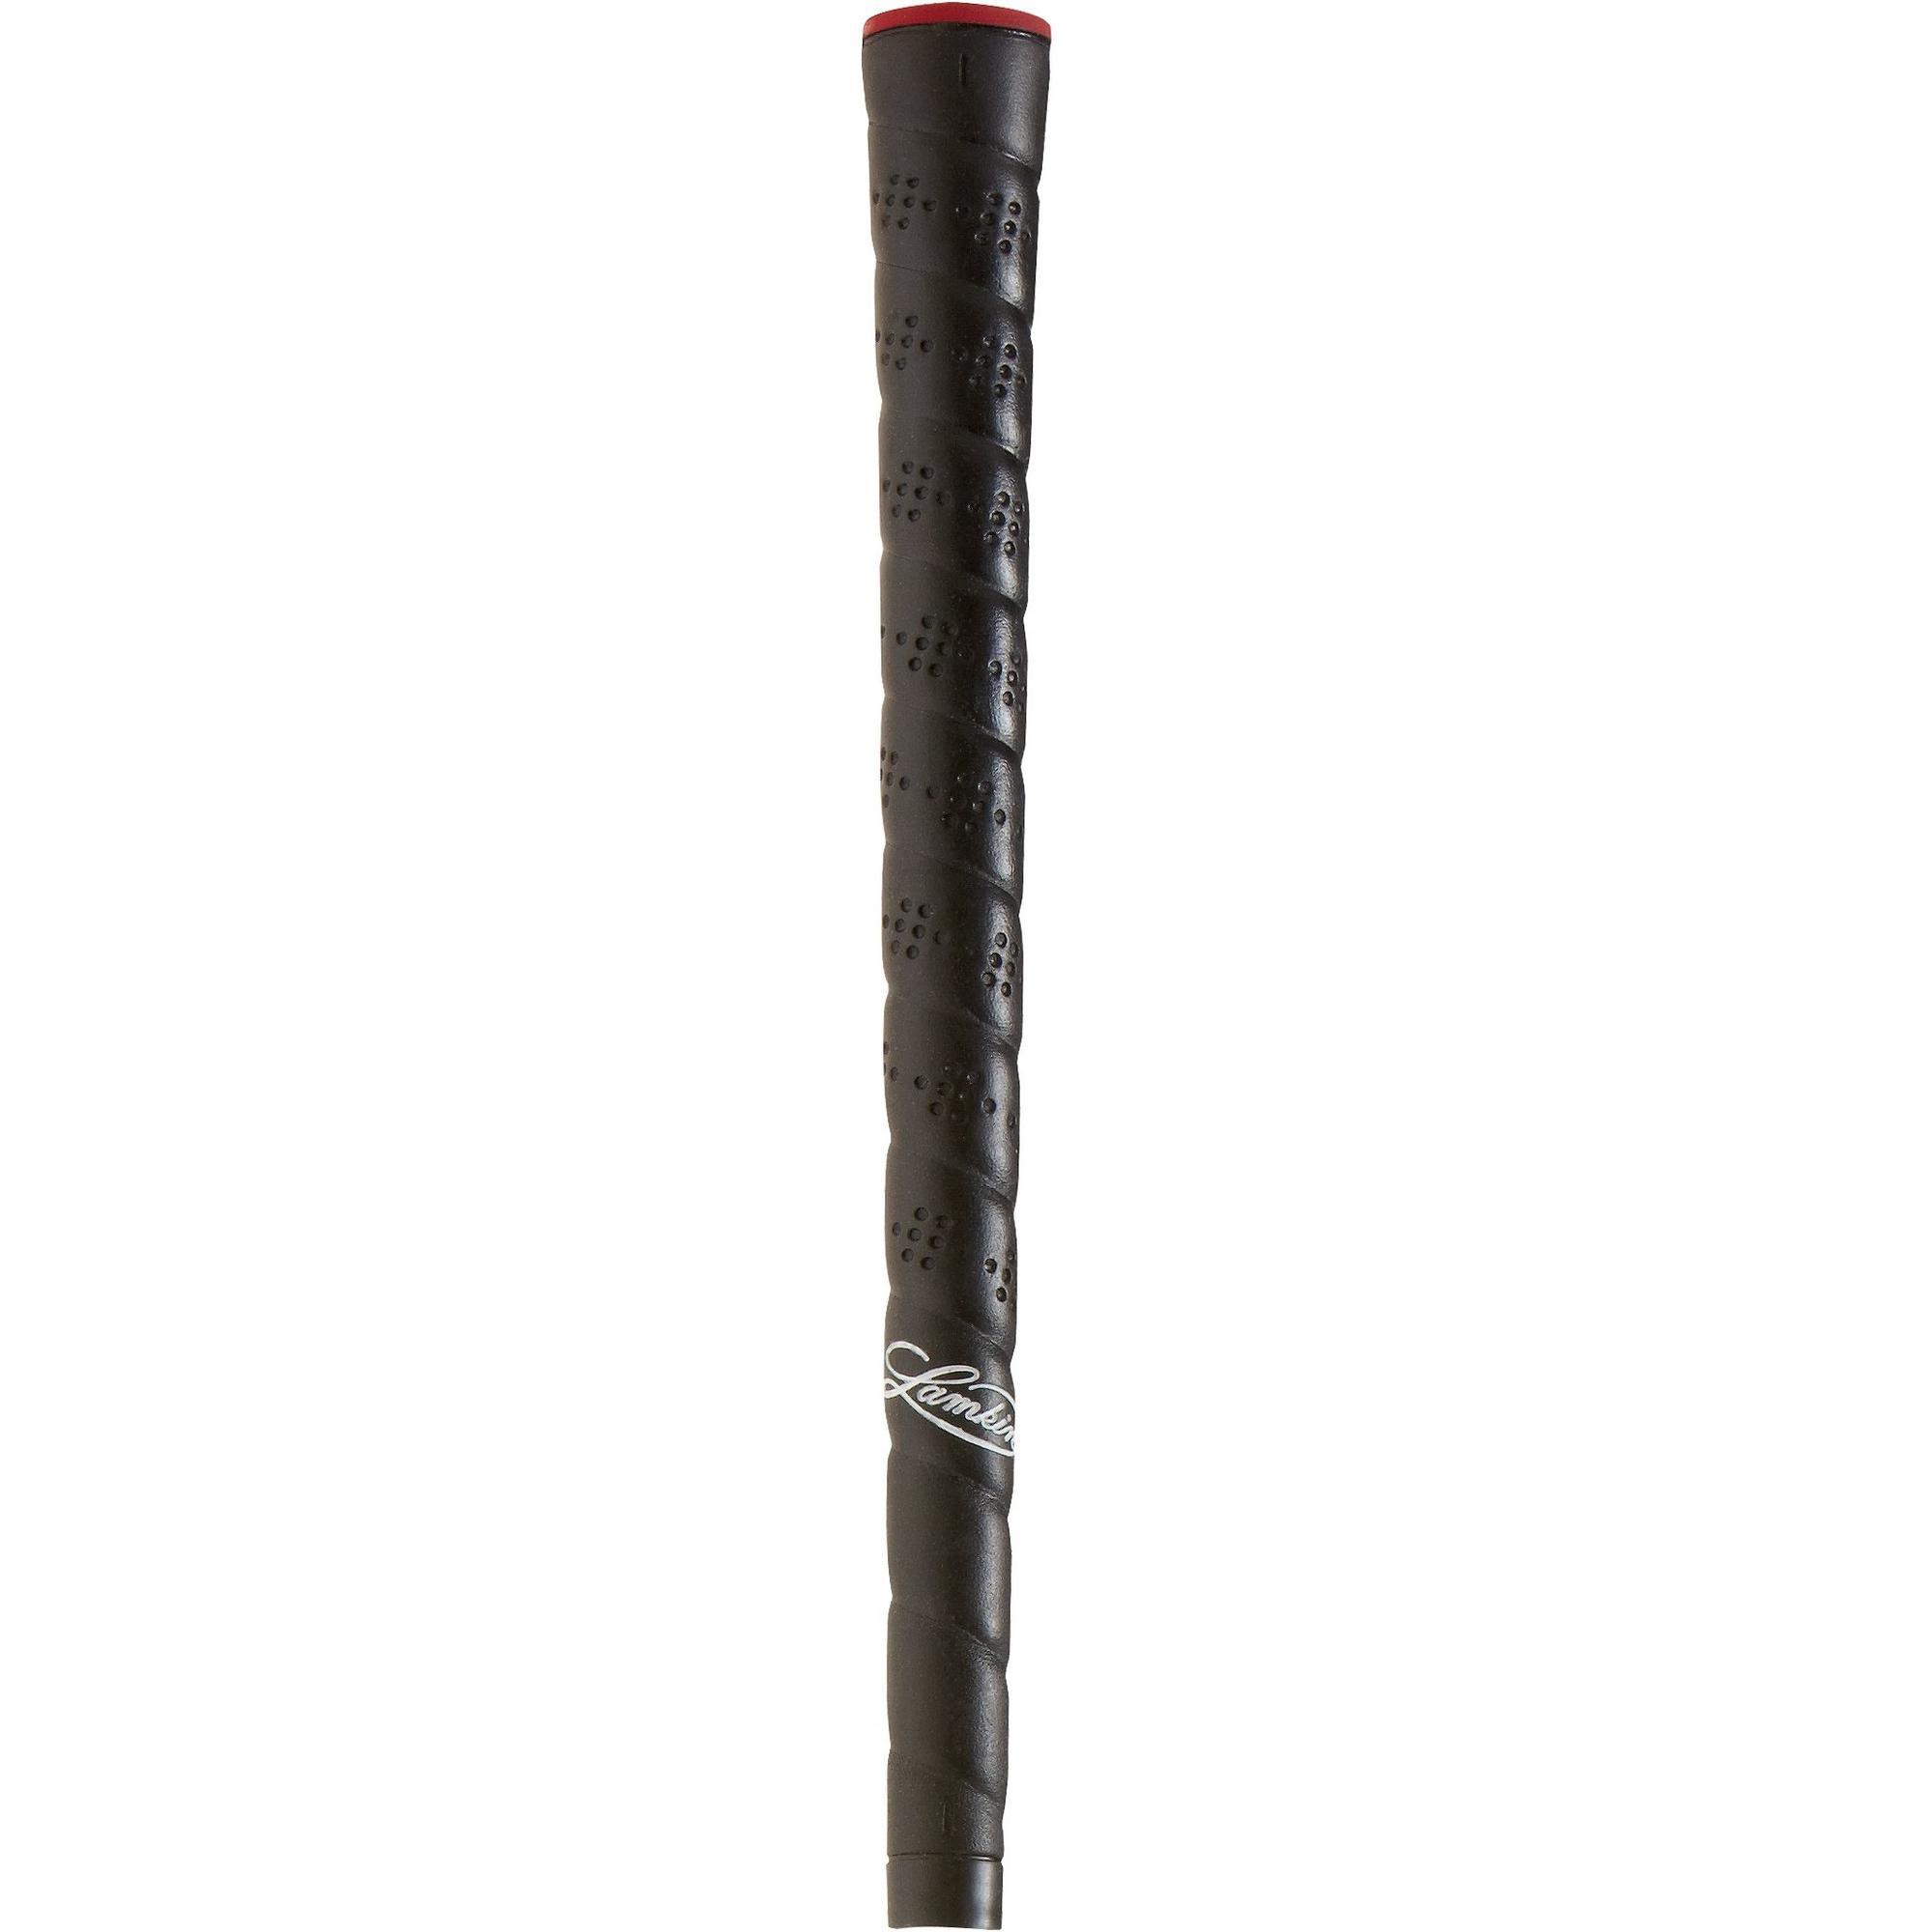 "Perma-Wrap ACE Midsize Black Grip (+1/16"")"